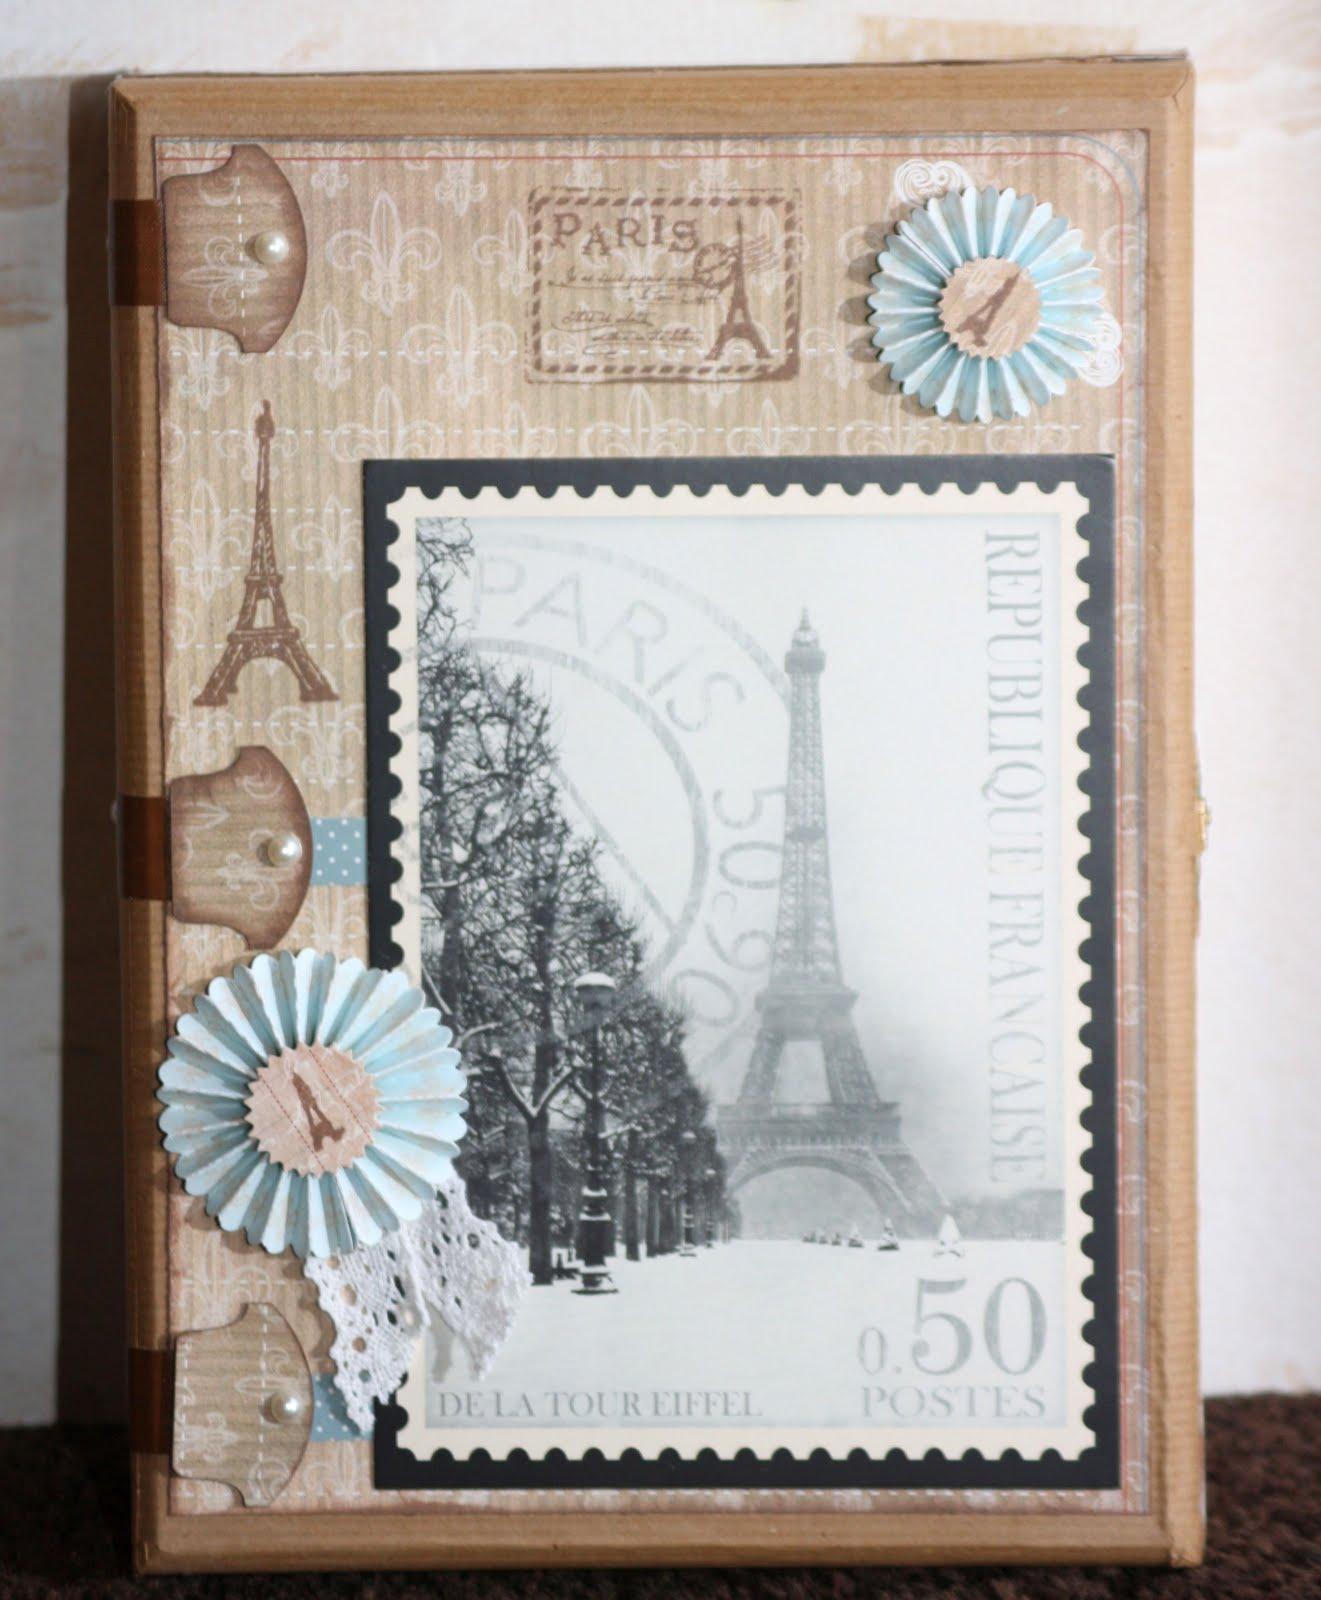 Kreative ideen rund ums basteln scrapbooking kochen und backen schmuckkiste paris - Scrapbook ideen ...